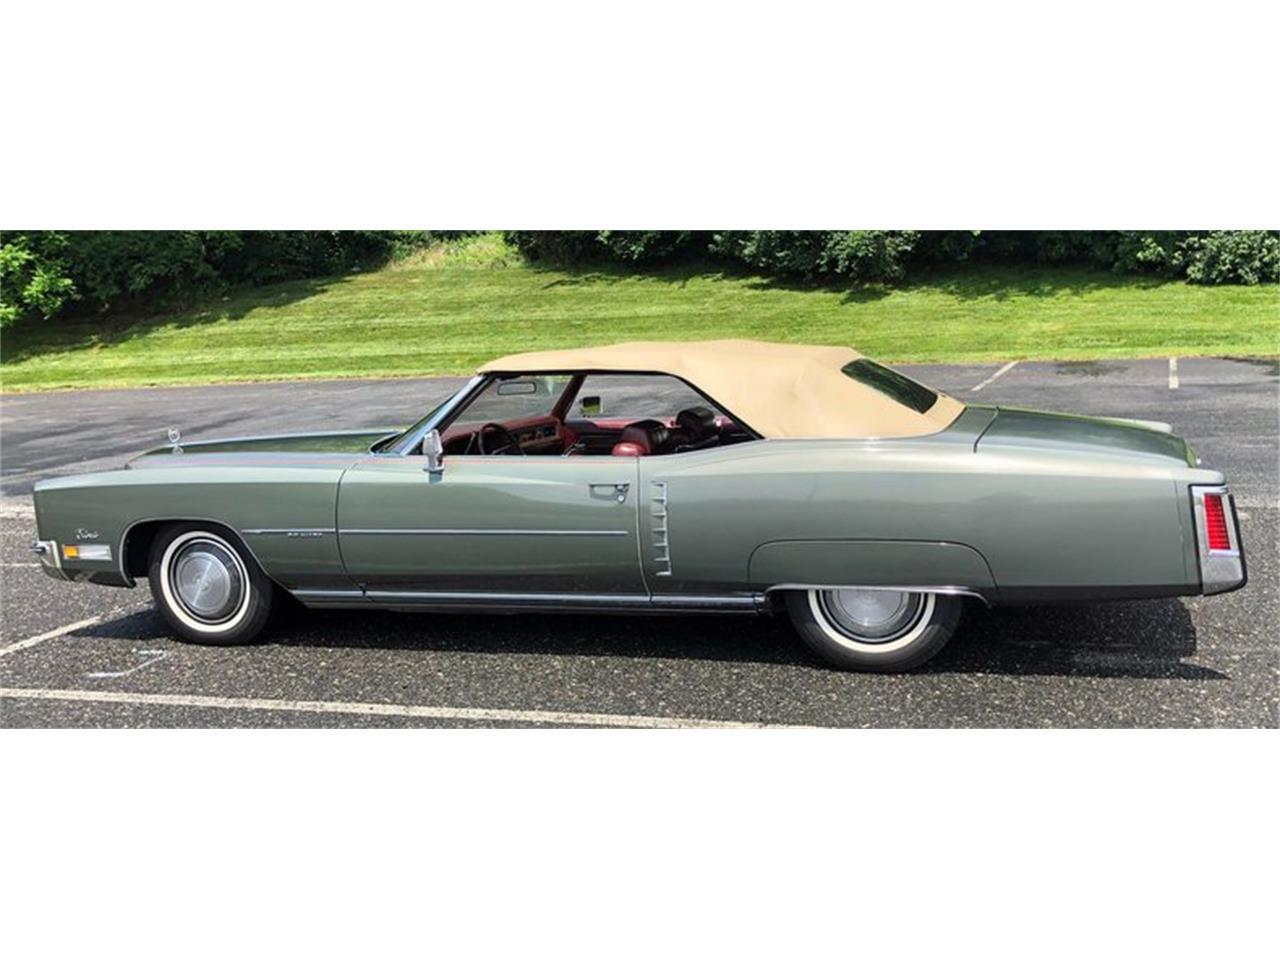 1972 Cadillac Eldorado (CC-1364809) for sale in West Chester, Pennsylvania